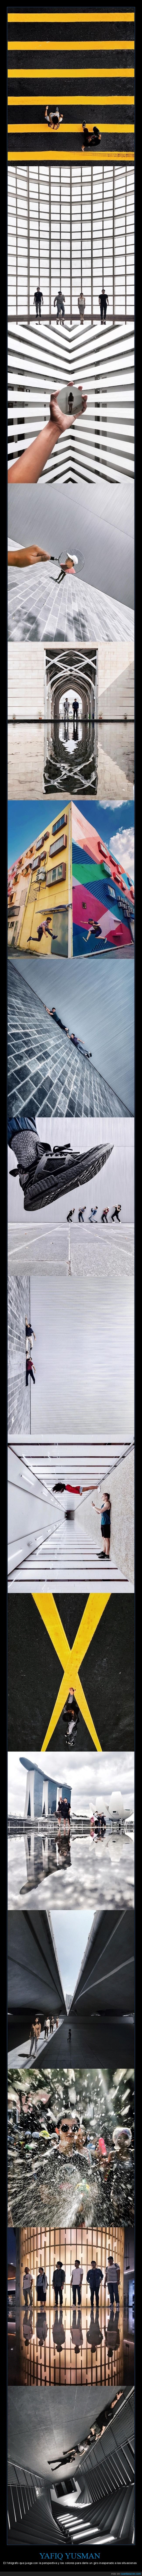 fotografía,perspectiva,yafiq yusman